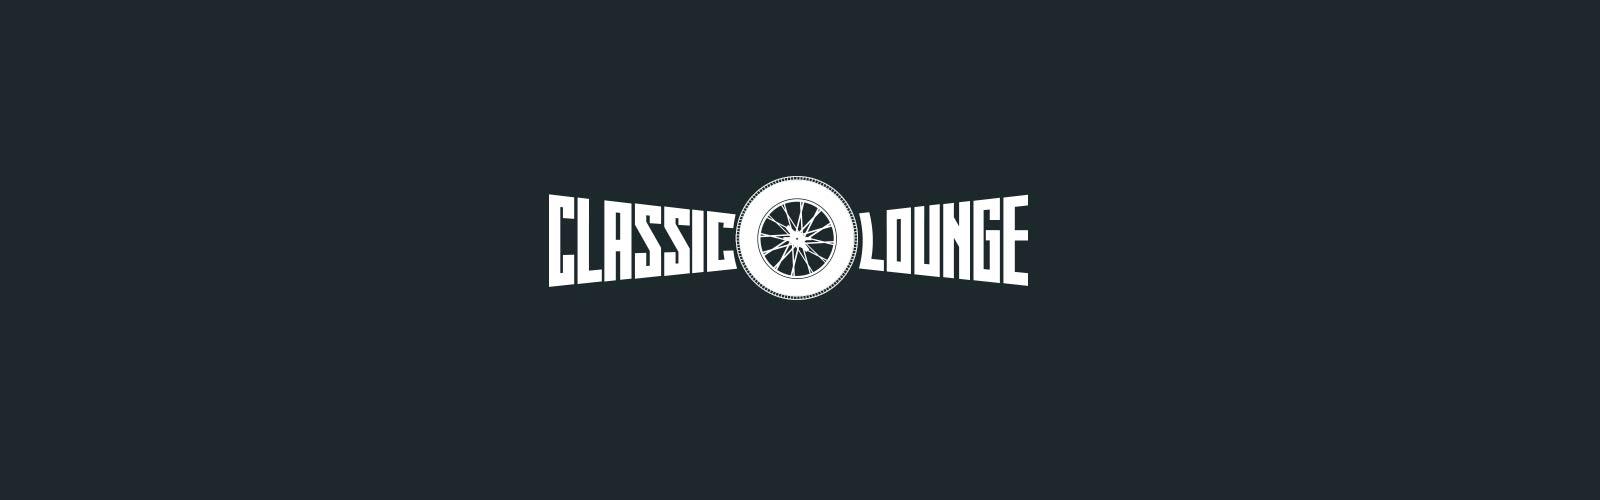 kathrin krasselt, mediendesign, grafik, grafiker, leipzig, werbung, webdesign, logo, corporate, design, classic lounge